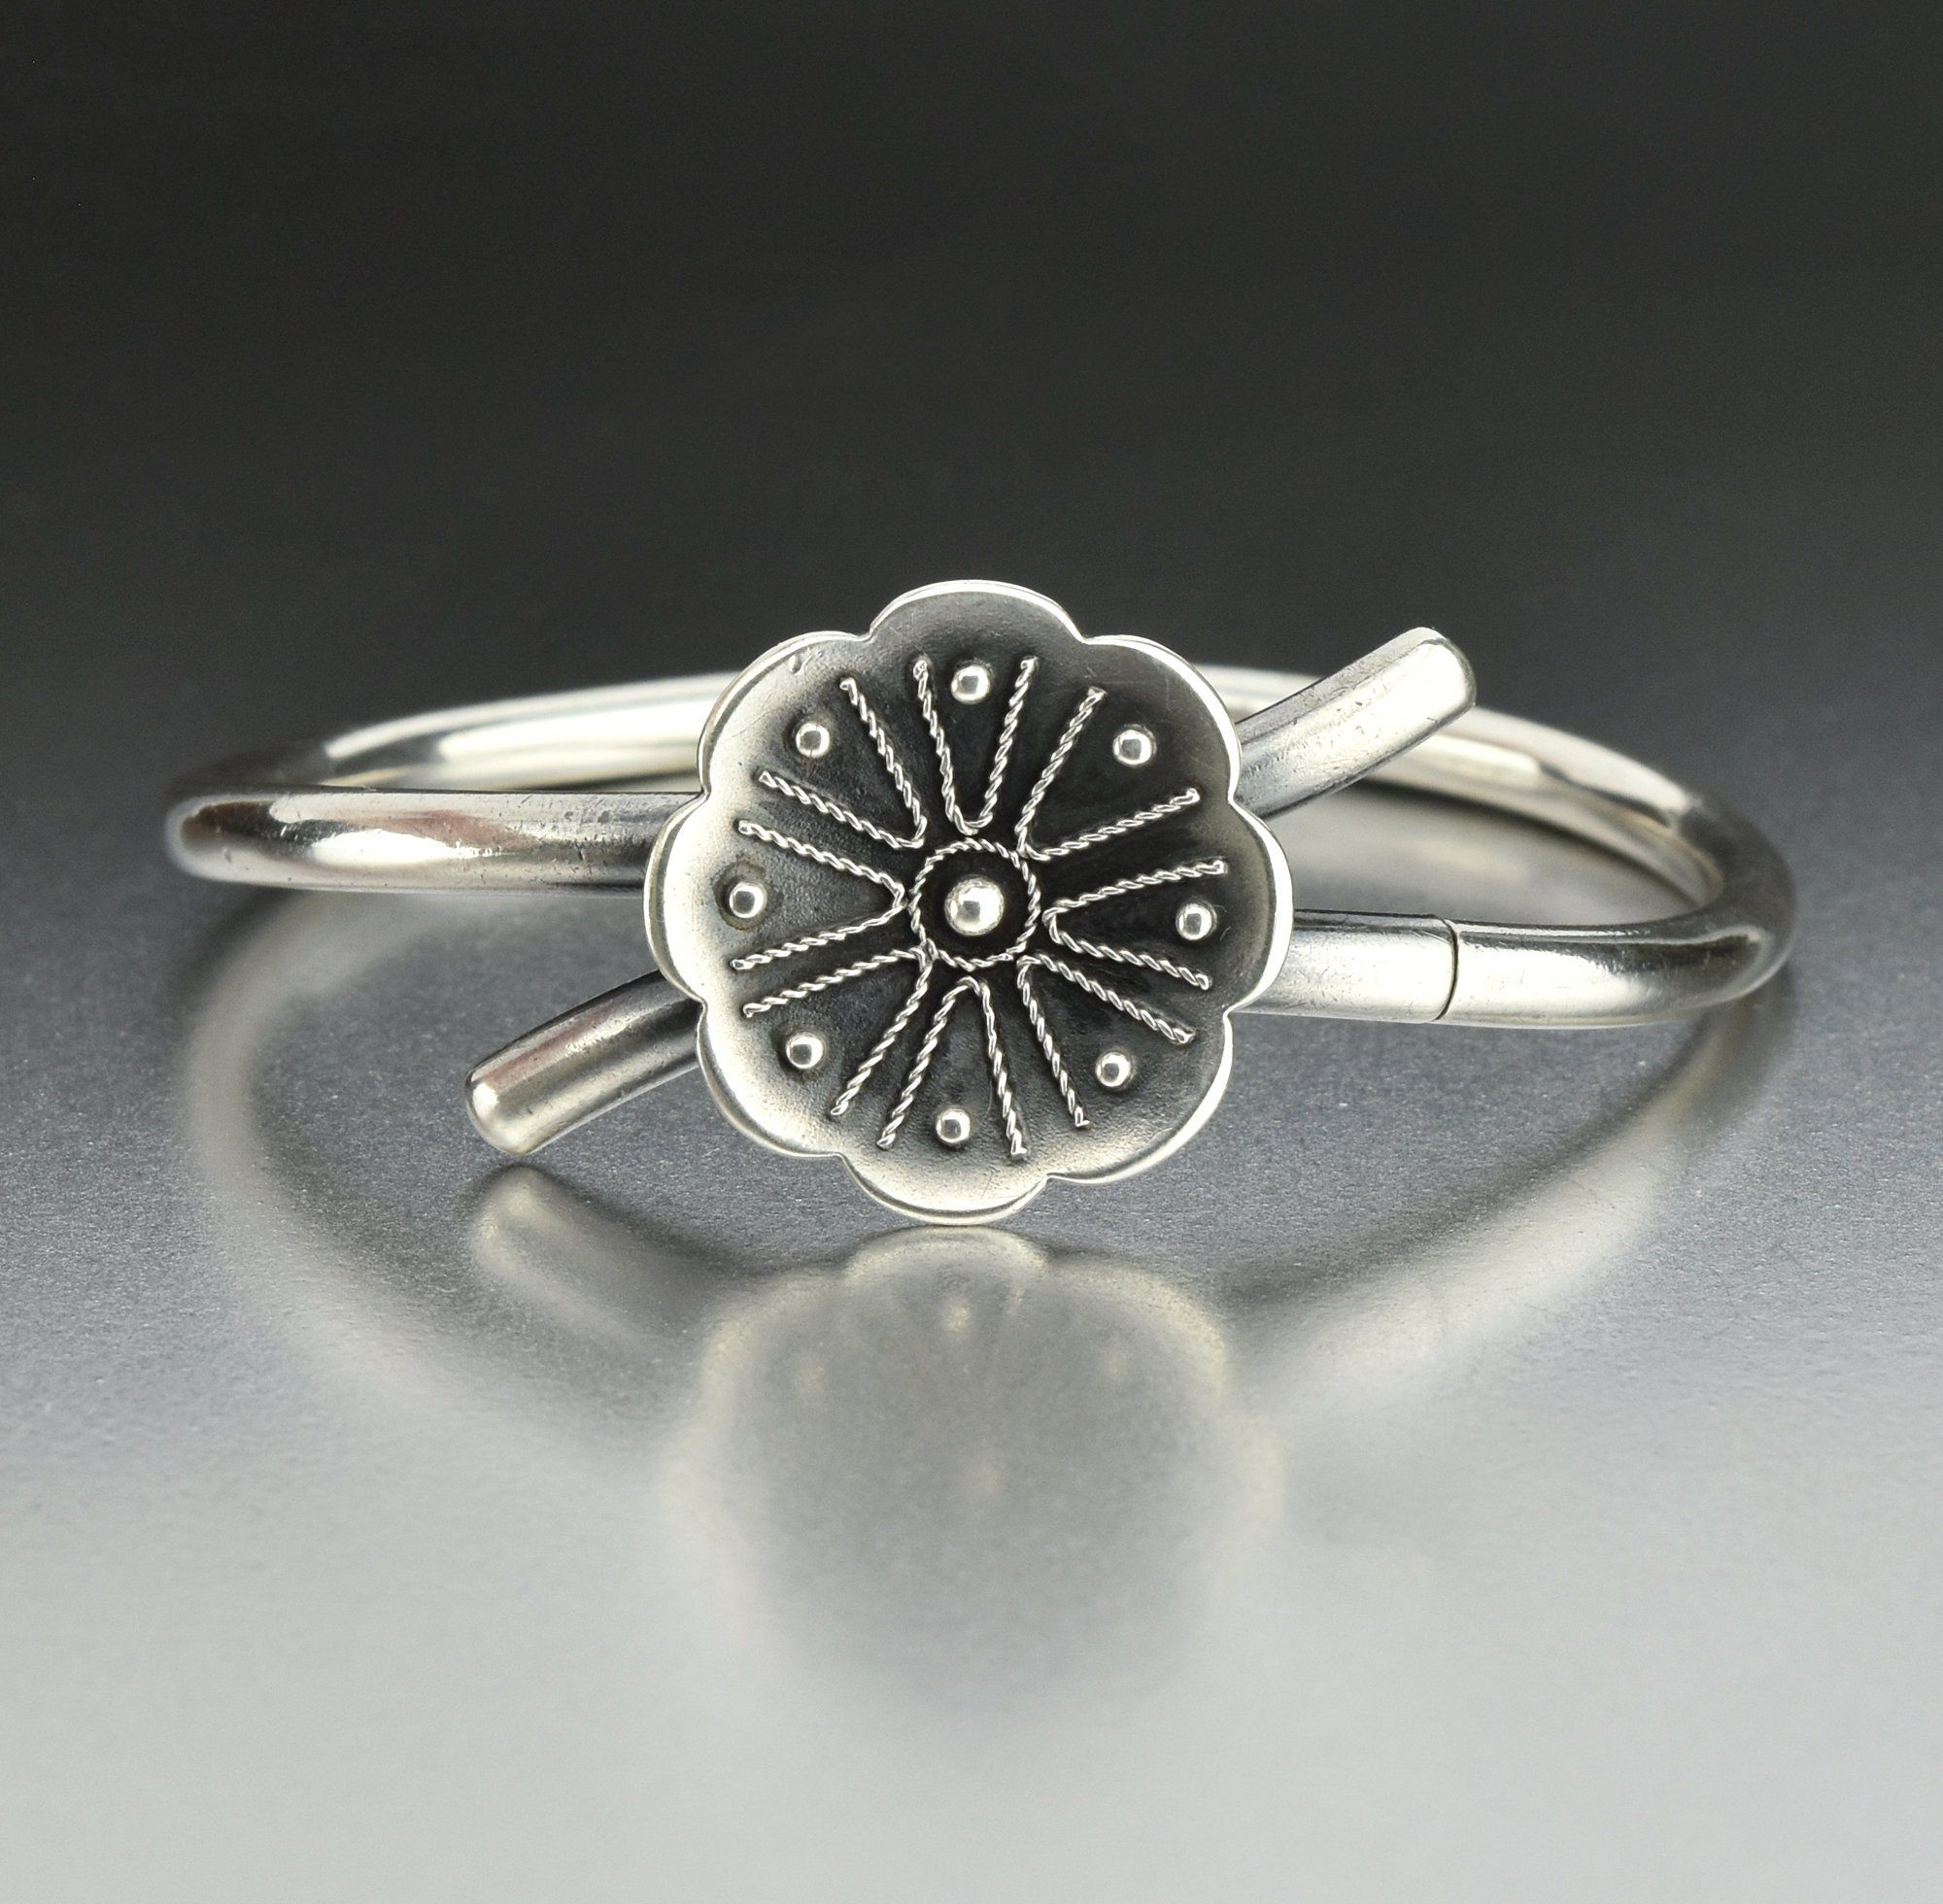 Flower Bypass Antique Victorian Silver Bracelet  #Sterling #Silver #Antique #Flower #Bracelet #Victorian #Simple #Quartz #Buy #Citrine